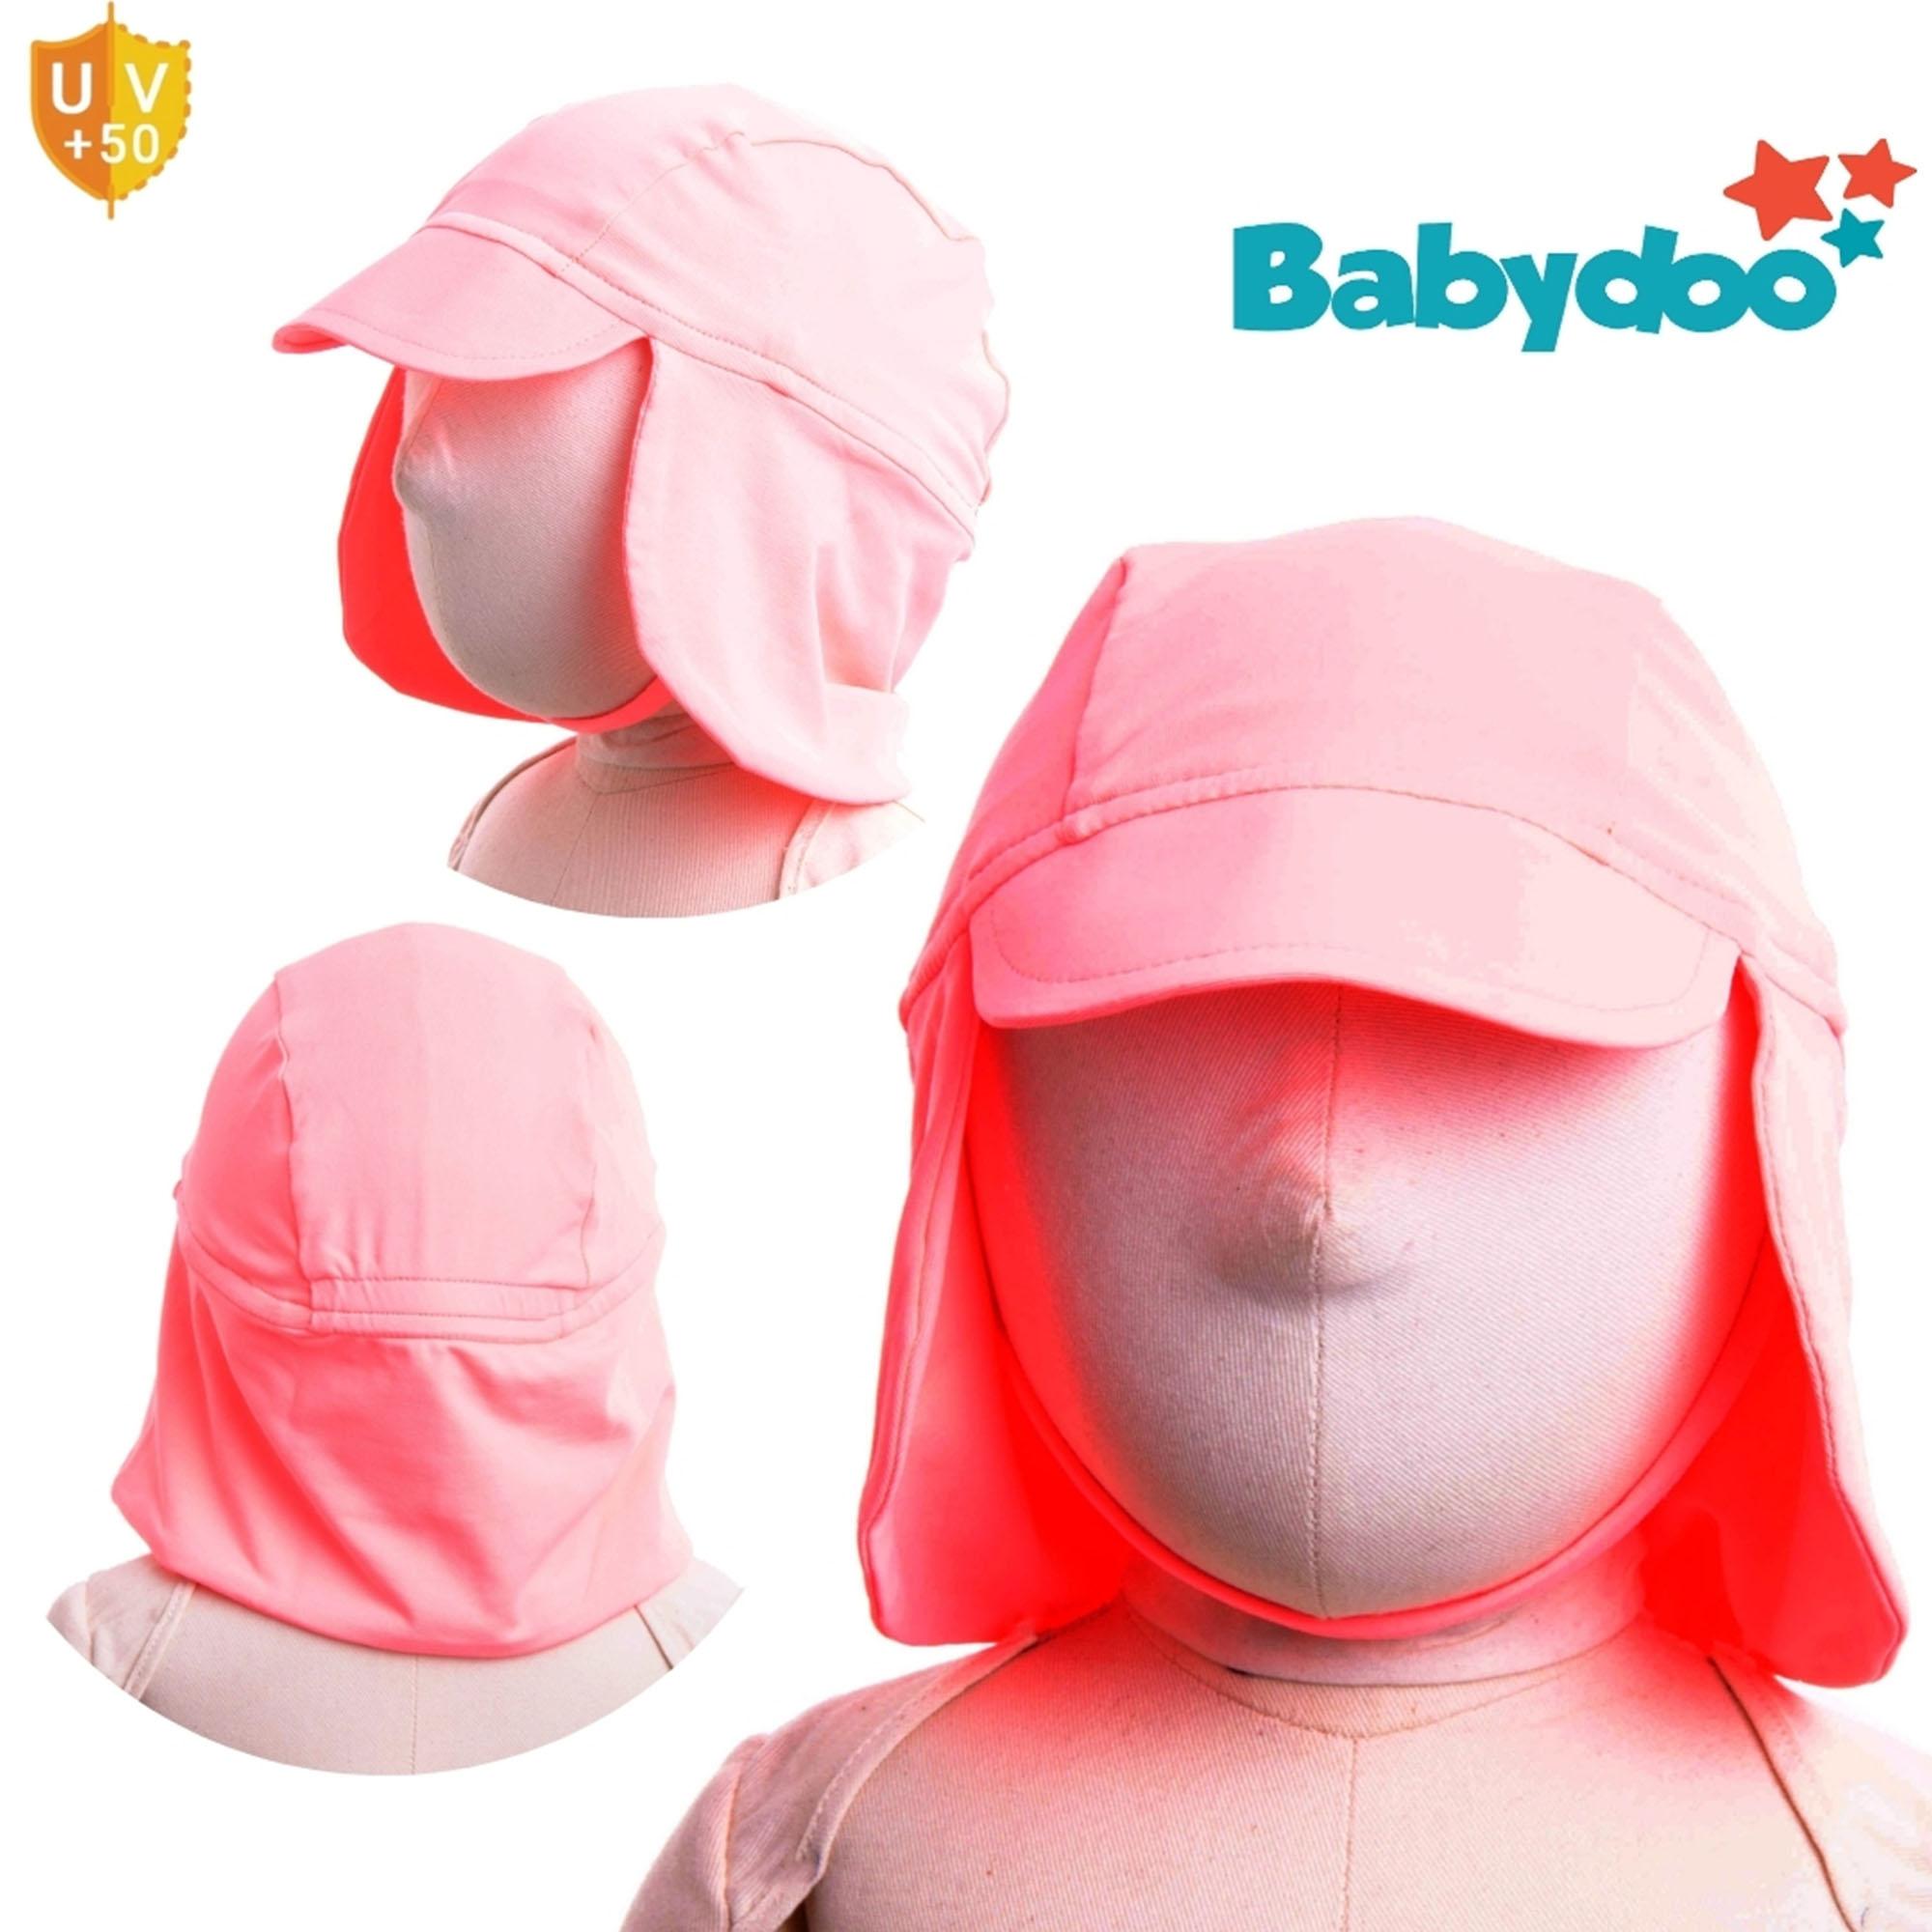 CHAPÉU UV+50 AVIADOR BABY